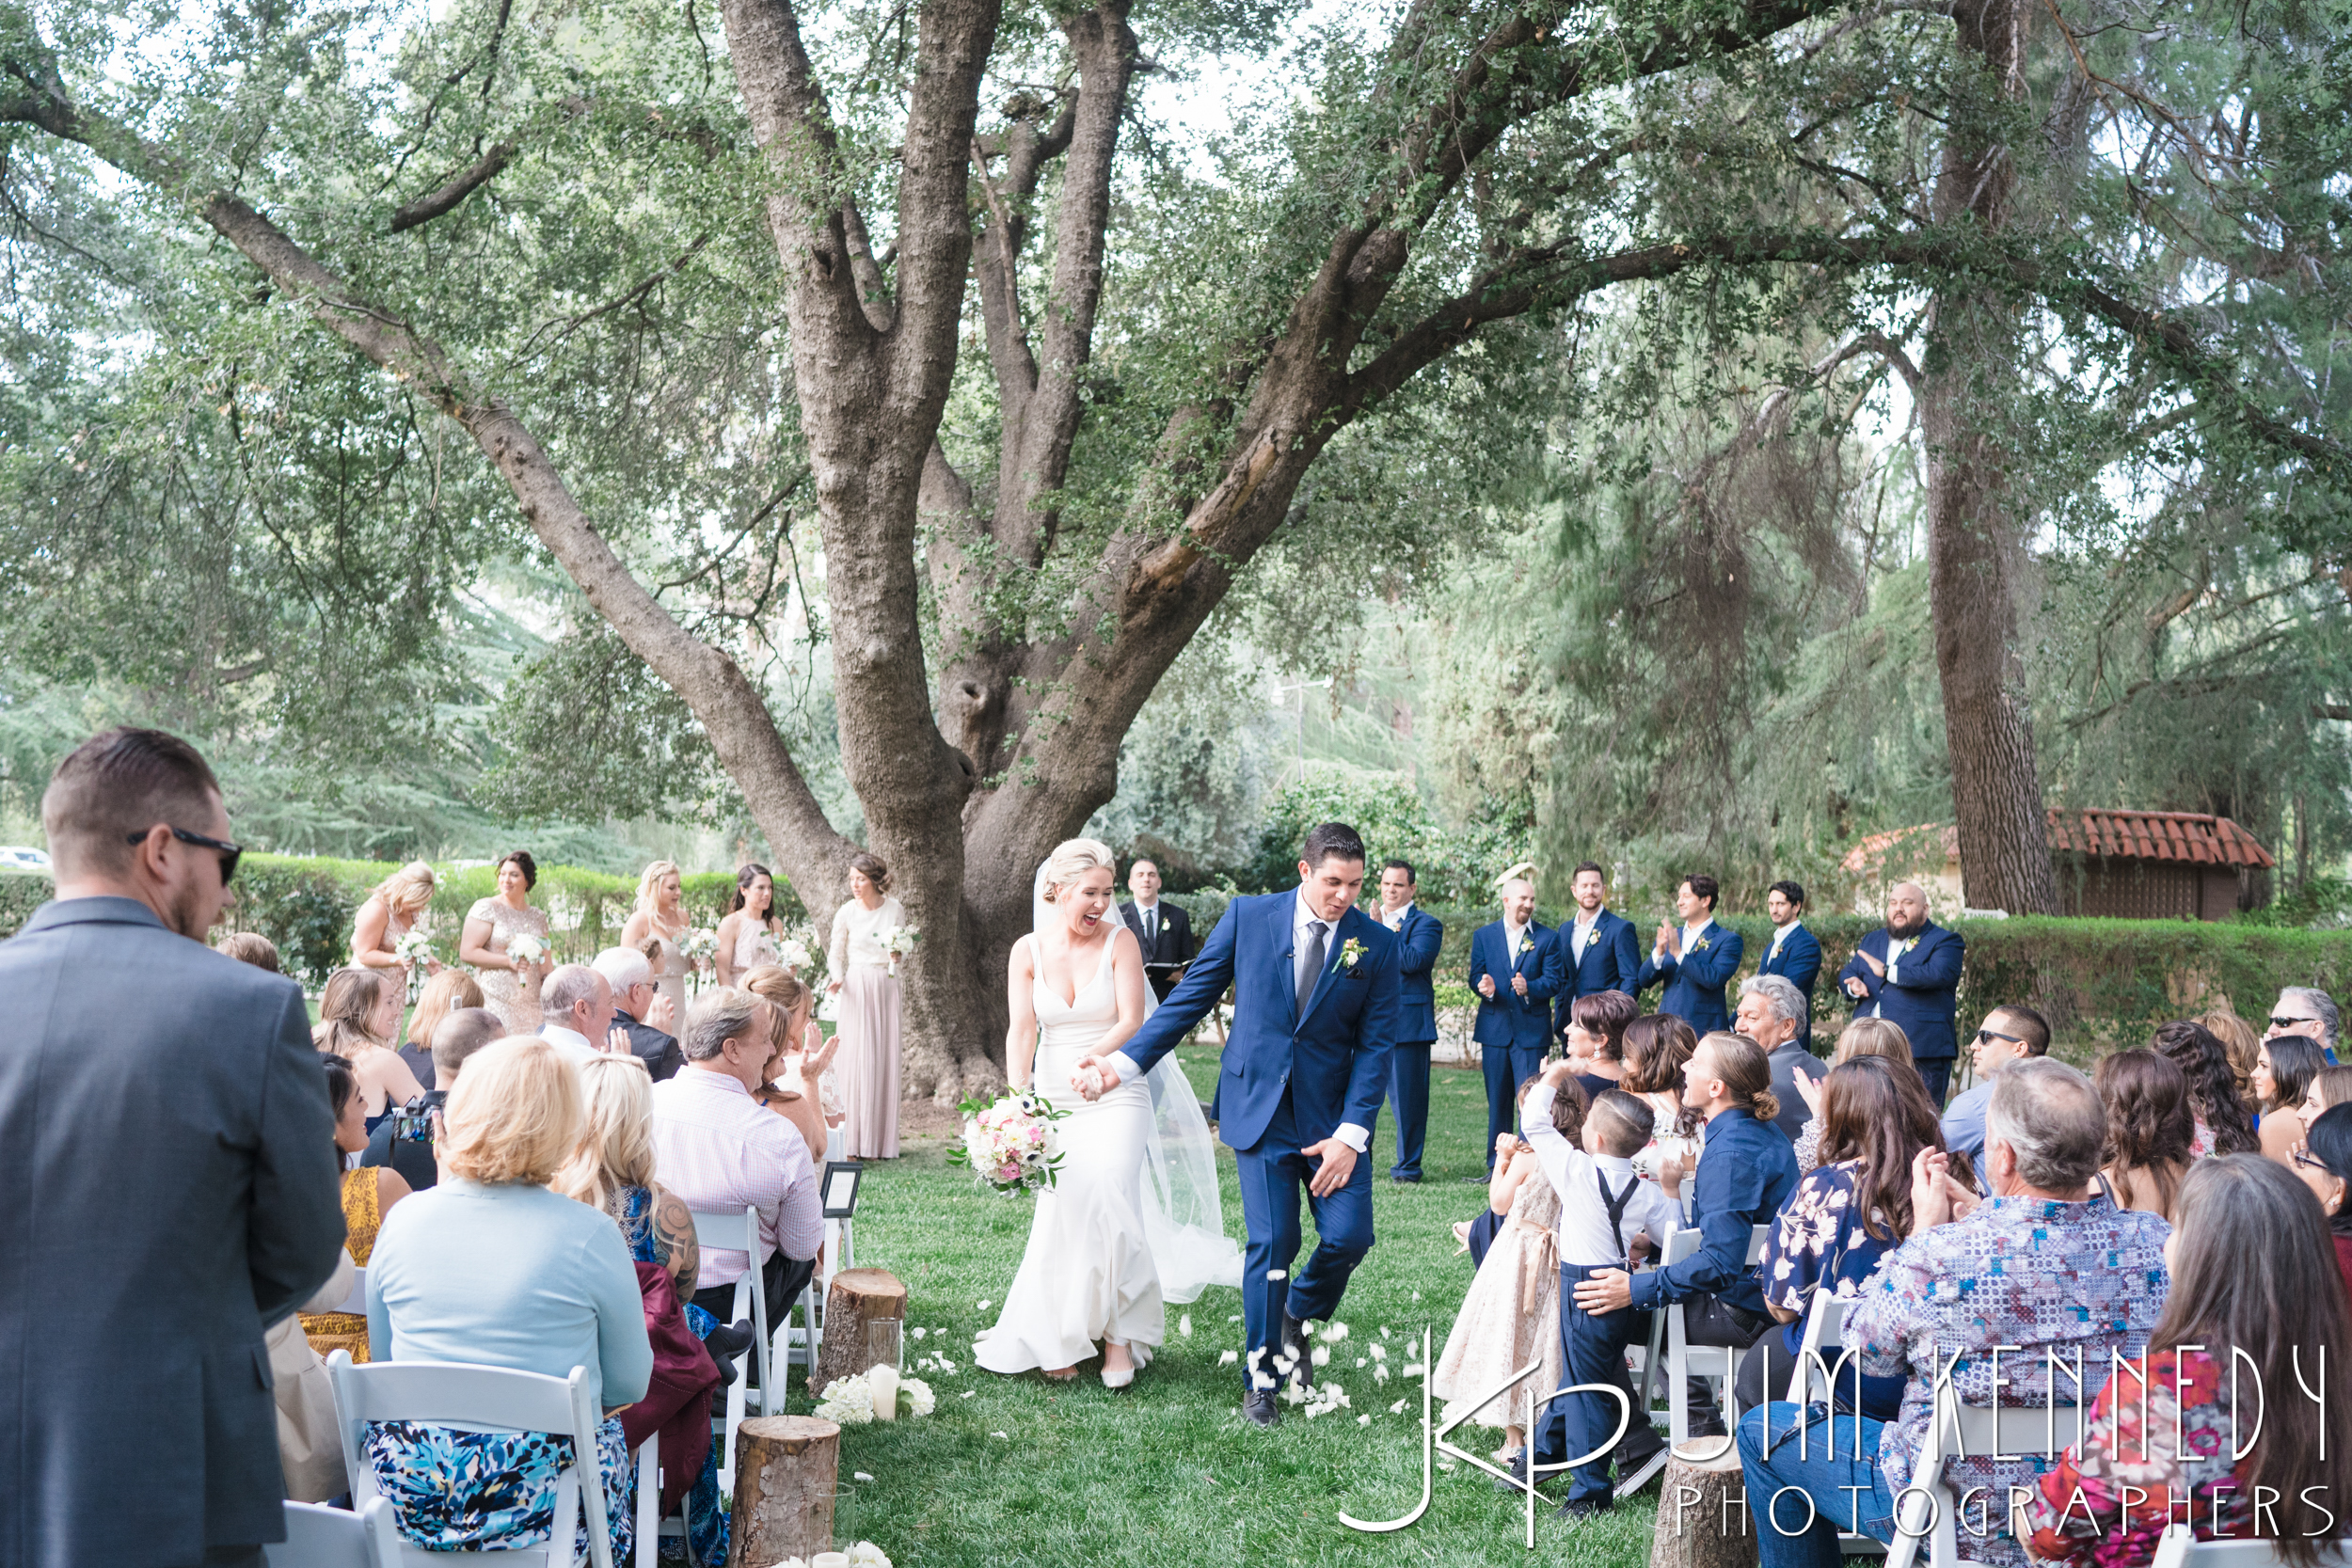 jim_kennedy_photographers_highland_springs_wedding_caitlyn_0125.jpg